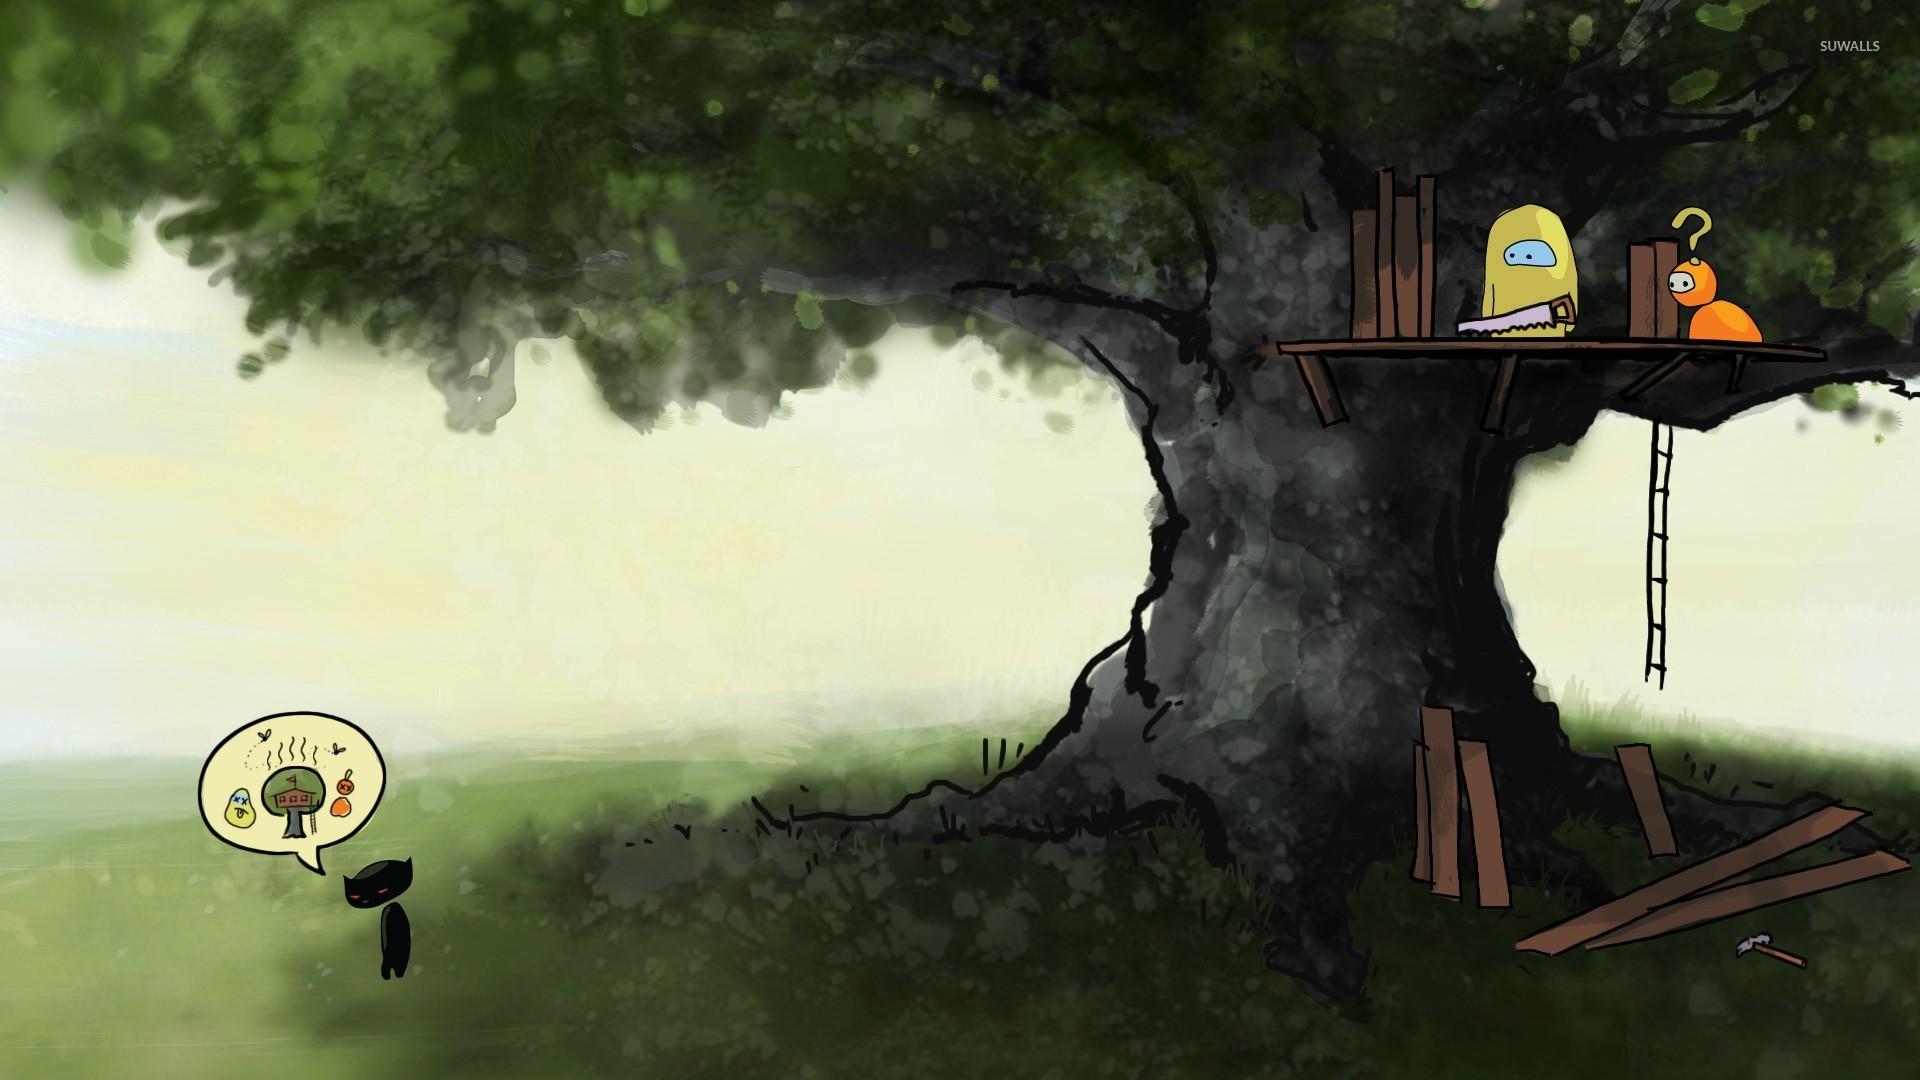 Black Kitten Dreaming Of A Tree House Wallpaper Digital